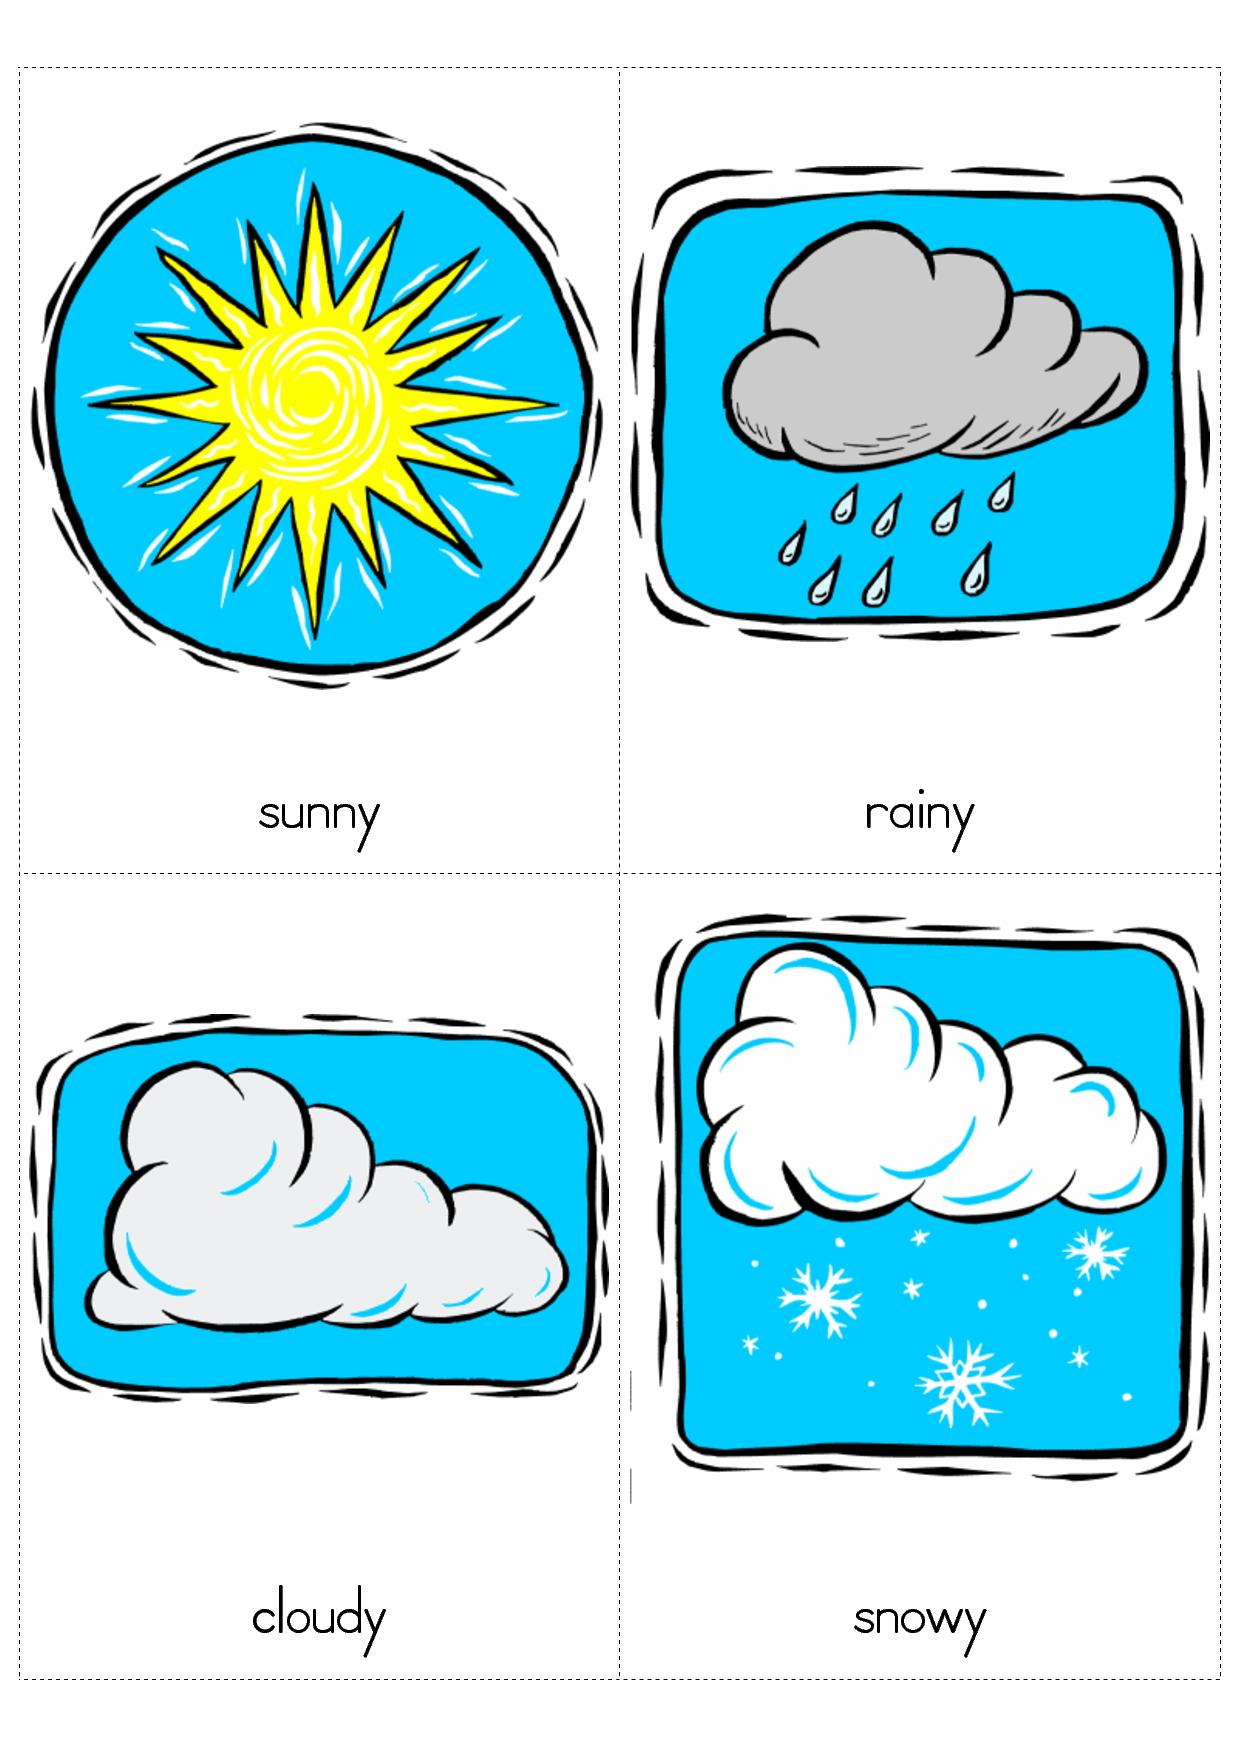 Windy clipart snowy weather. Sunny rainy cloudy preschool